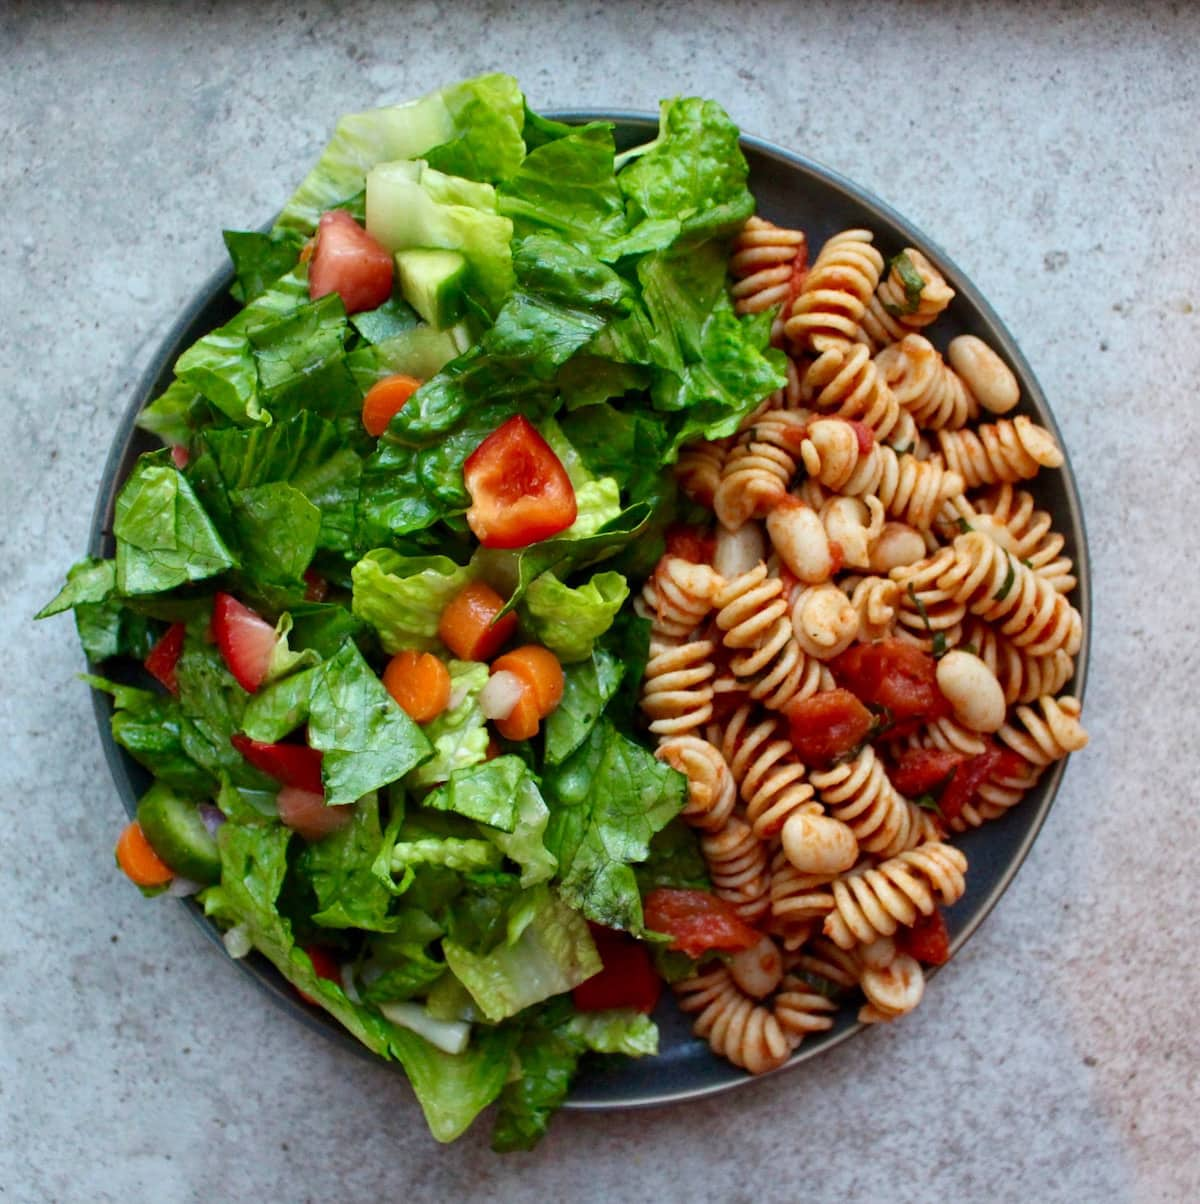 Vegan Meal Prep Ideas pasta salad